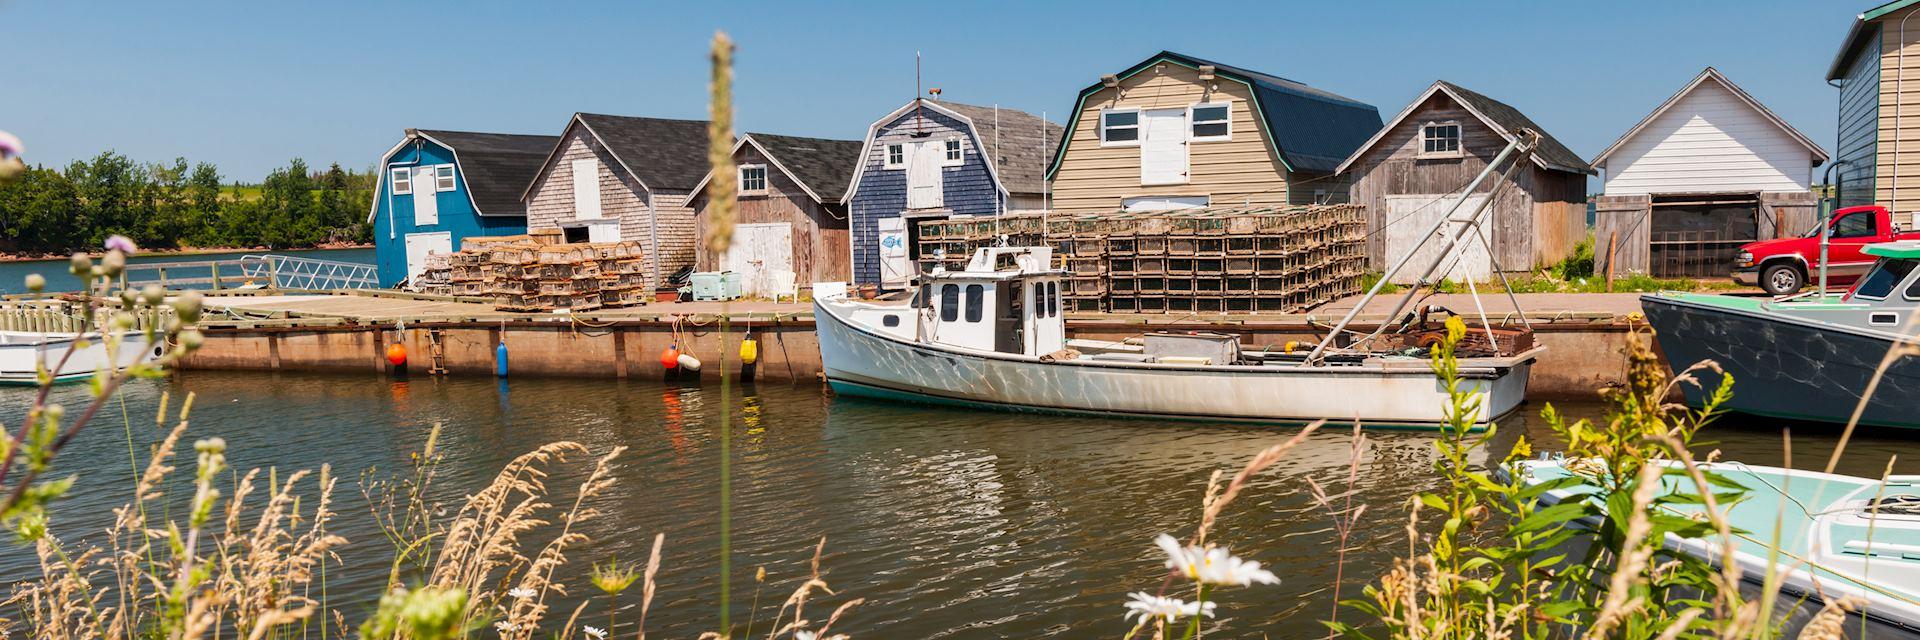 Fishing village near Cavendish, Prince Edward Island